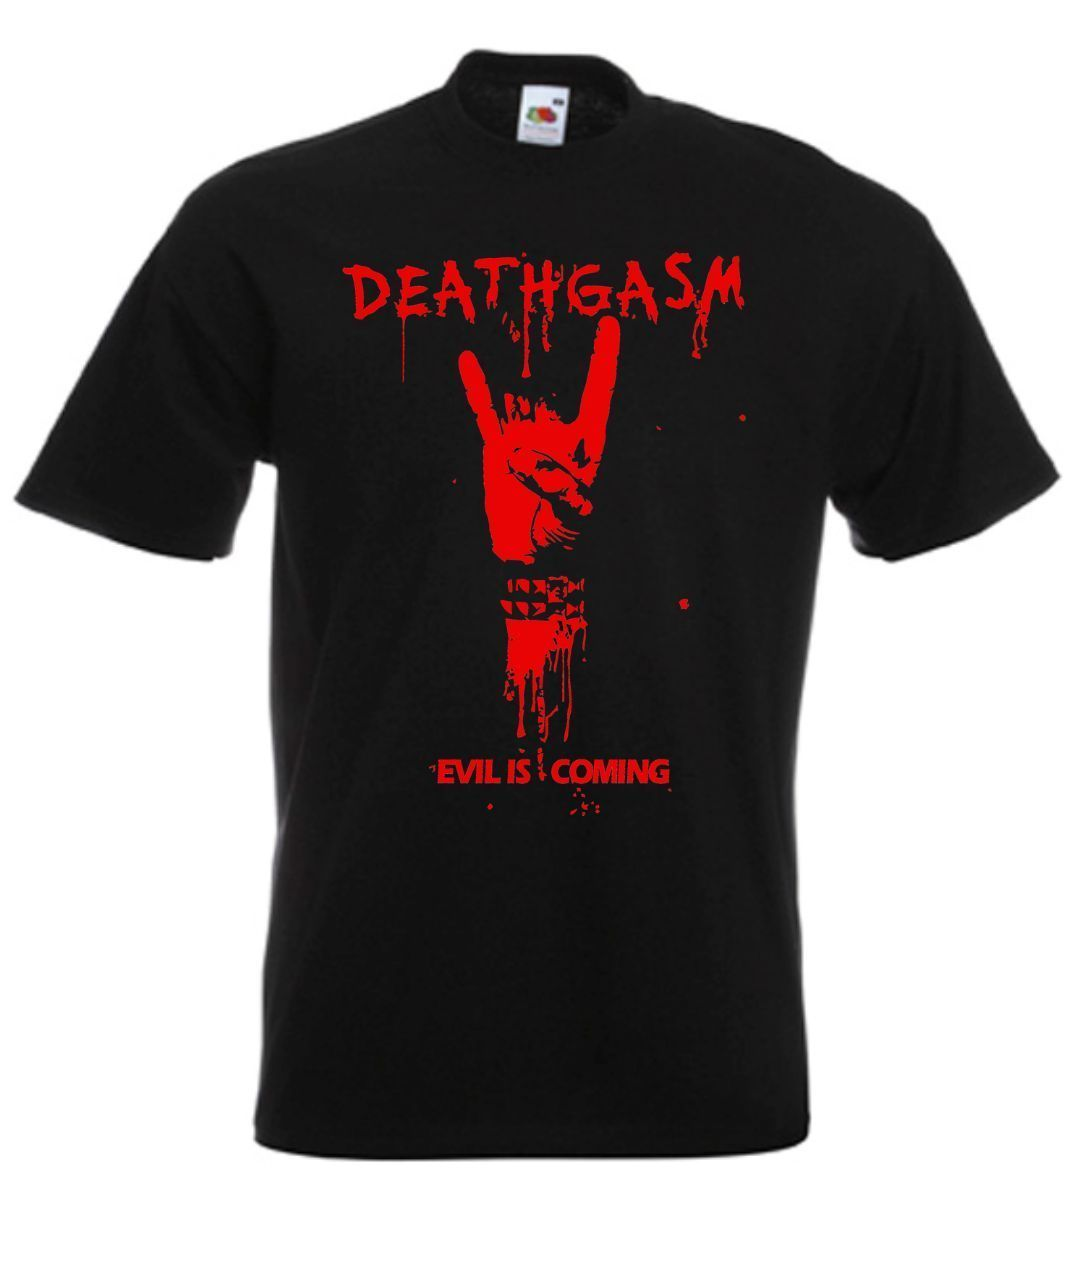 Deathgasm Comedy Horror Movie T Shirt